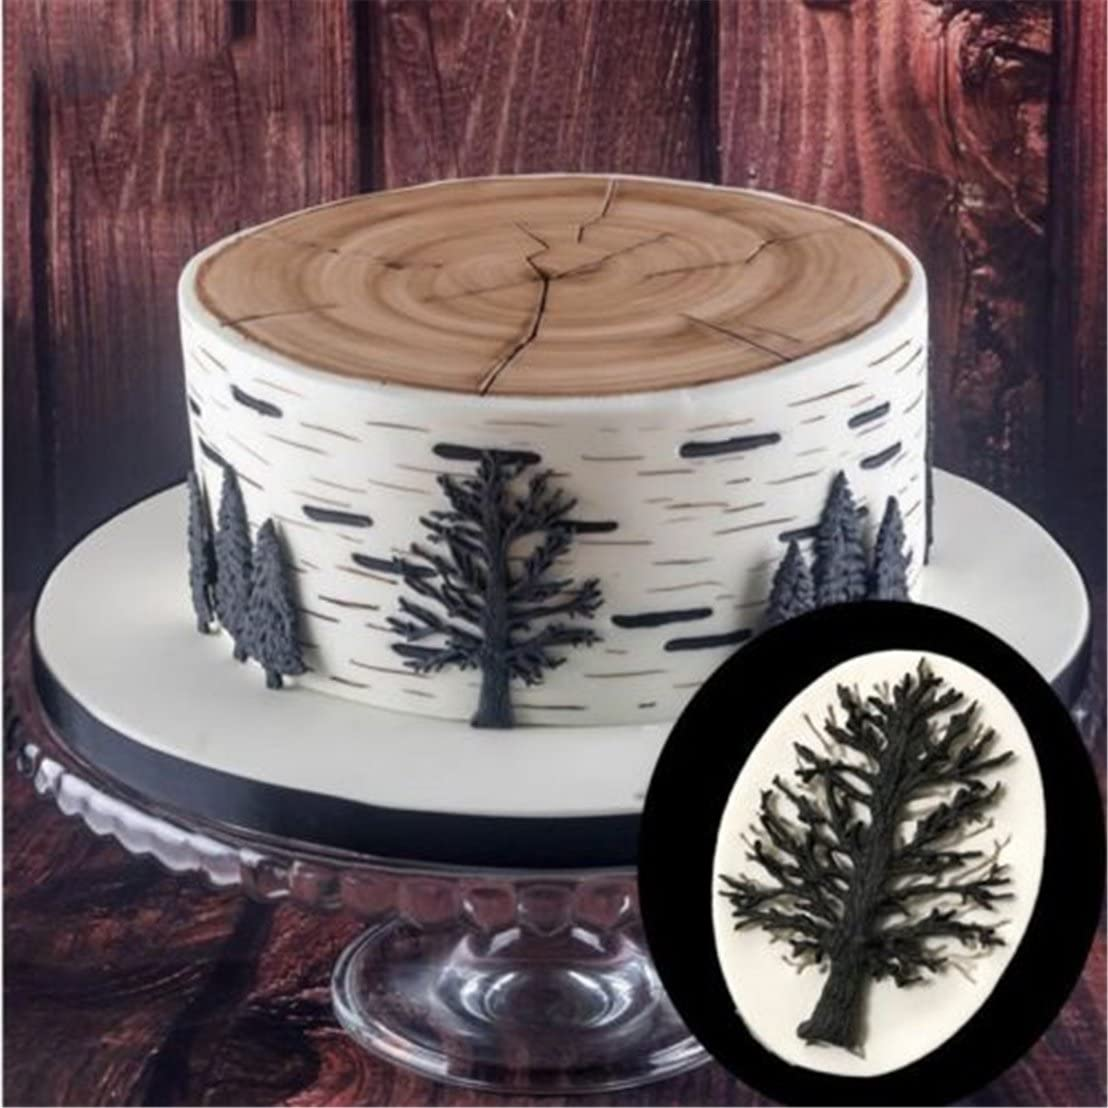 Christmas Tree Branch Silicone Mold Fondant Chocolate Cake Decor Mould DIY Bake